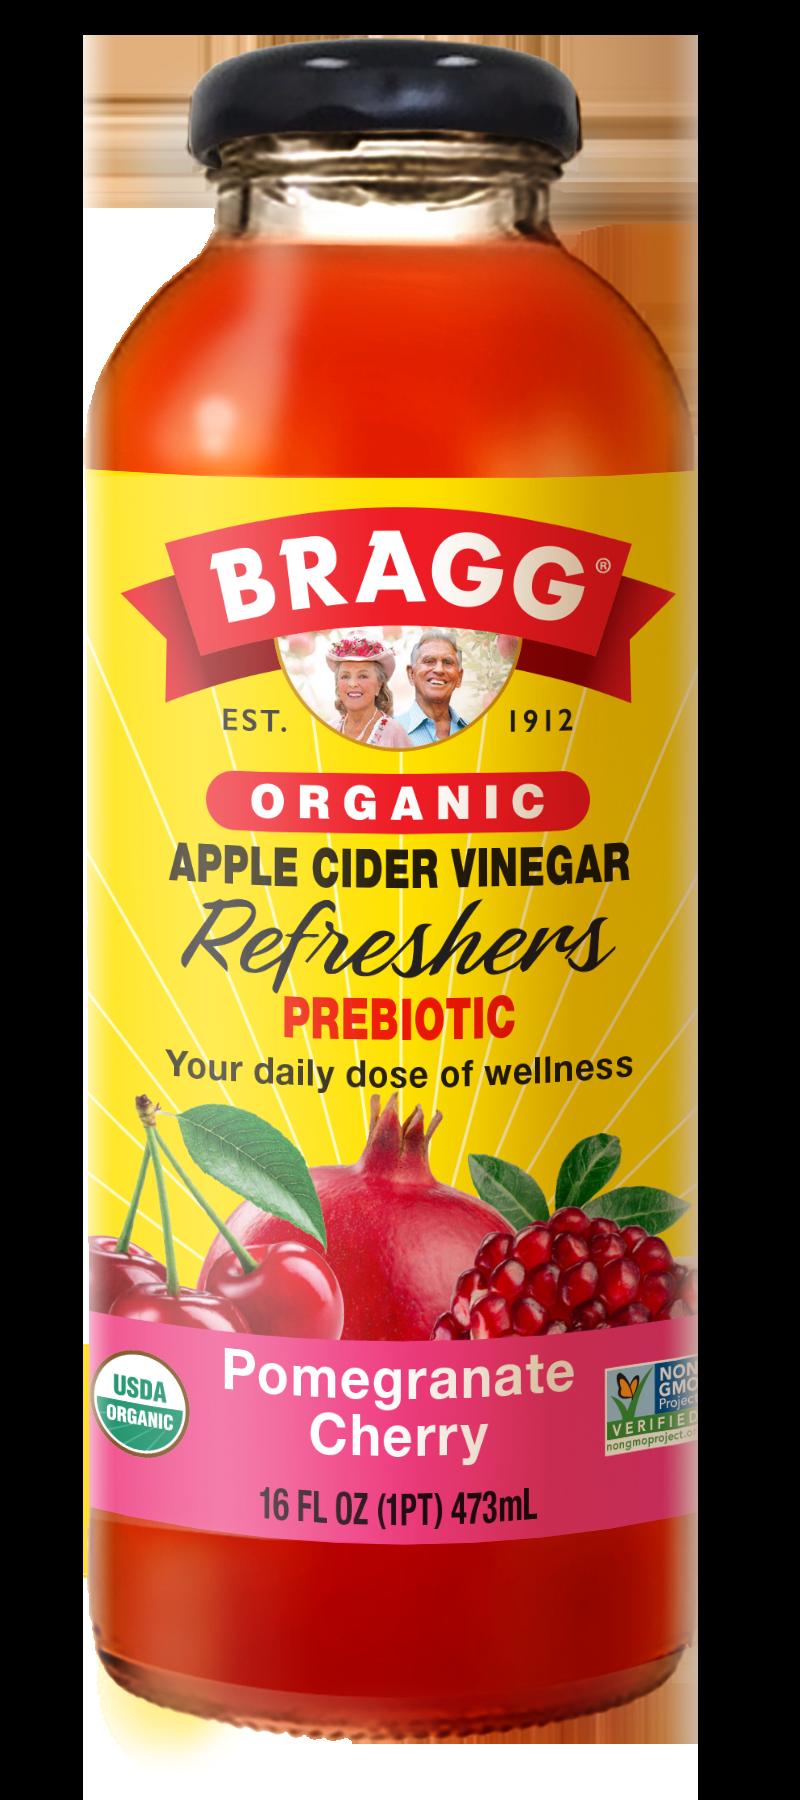 Bragg Apple Cider Vinegar Pomegranate Cherry